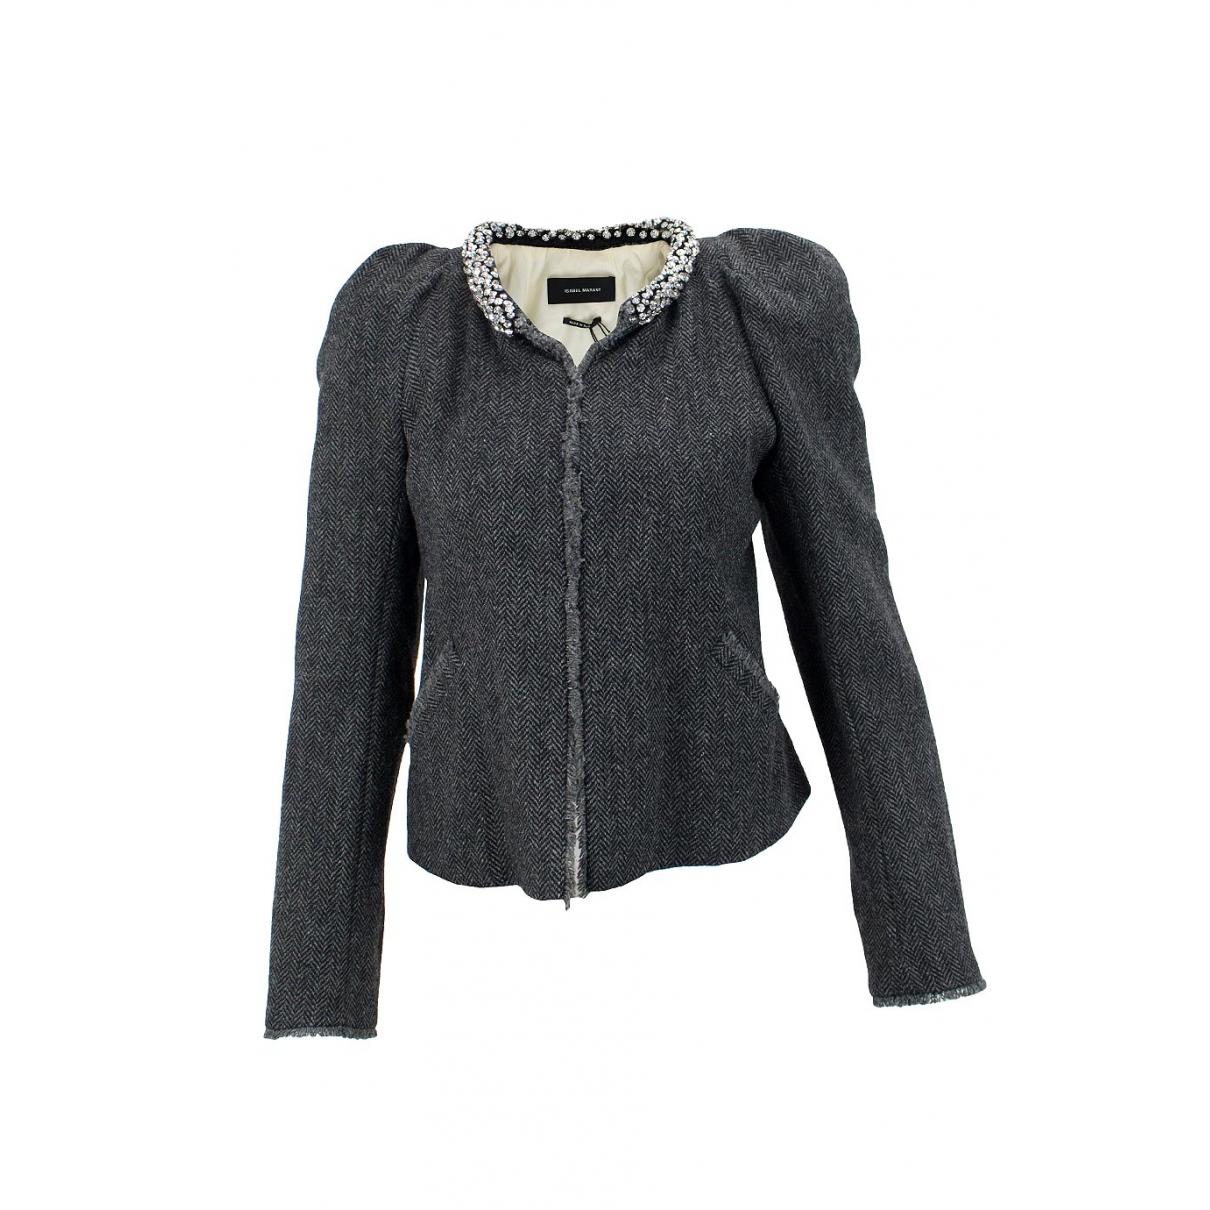 Isabel Marant \N Grey Wool jacket for Women 38 FR